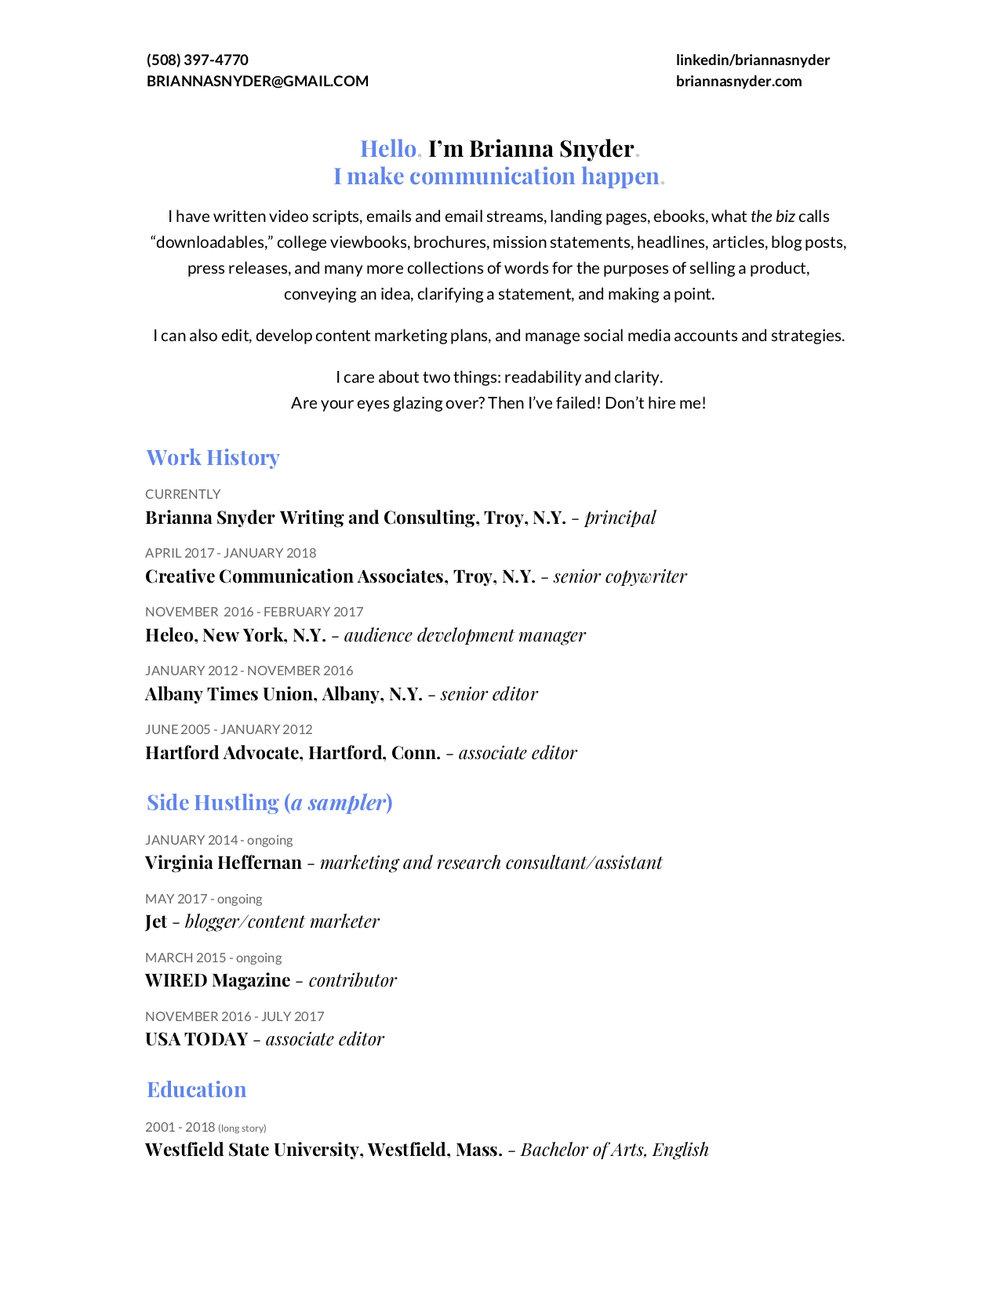 My Resume — Brianna Snyder